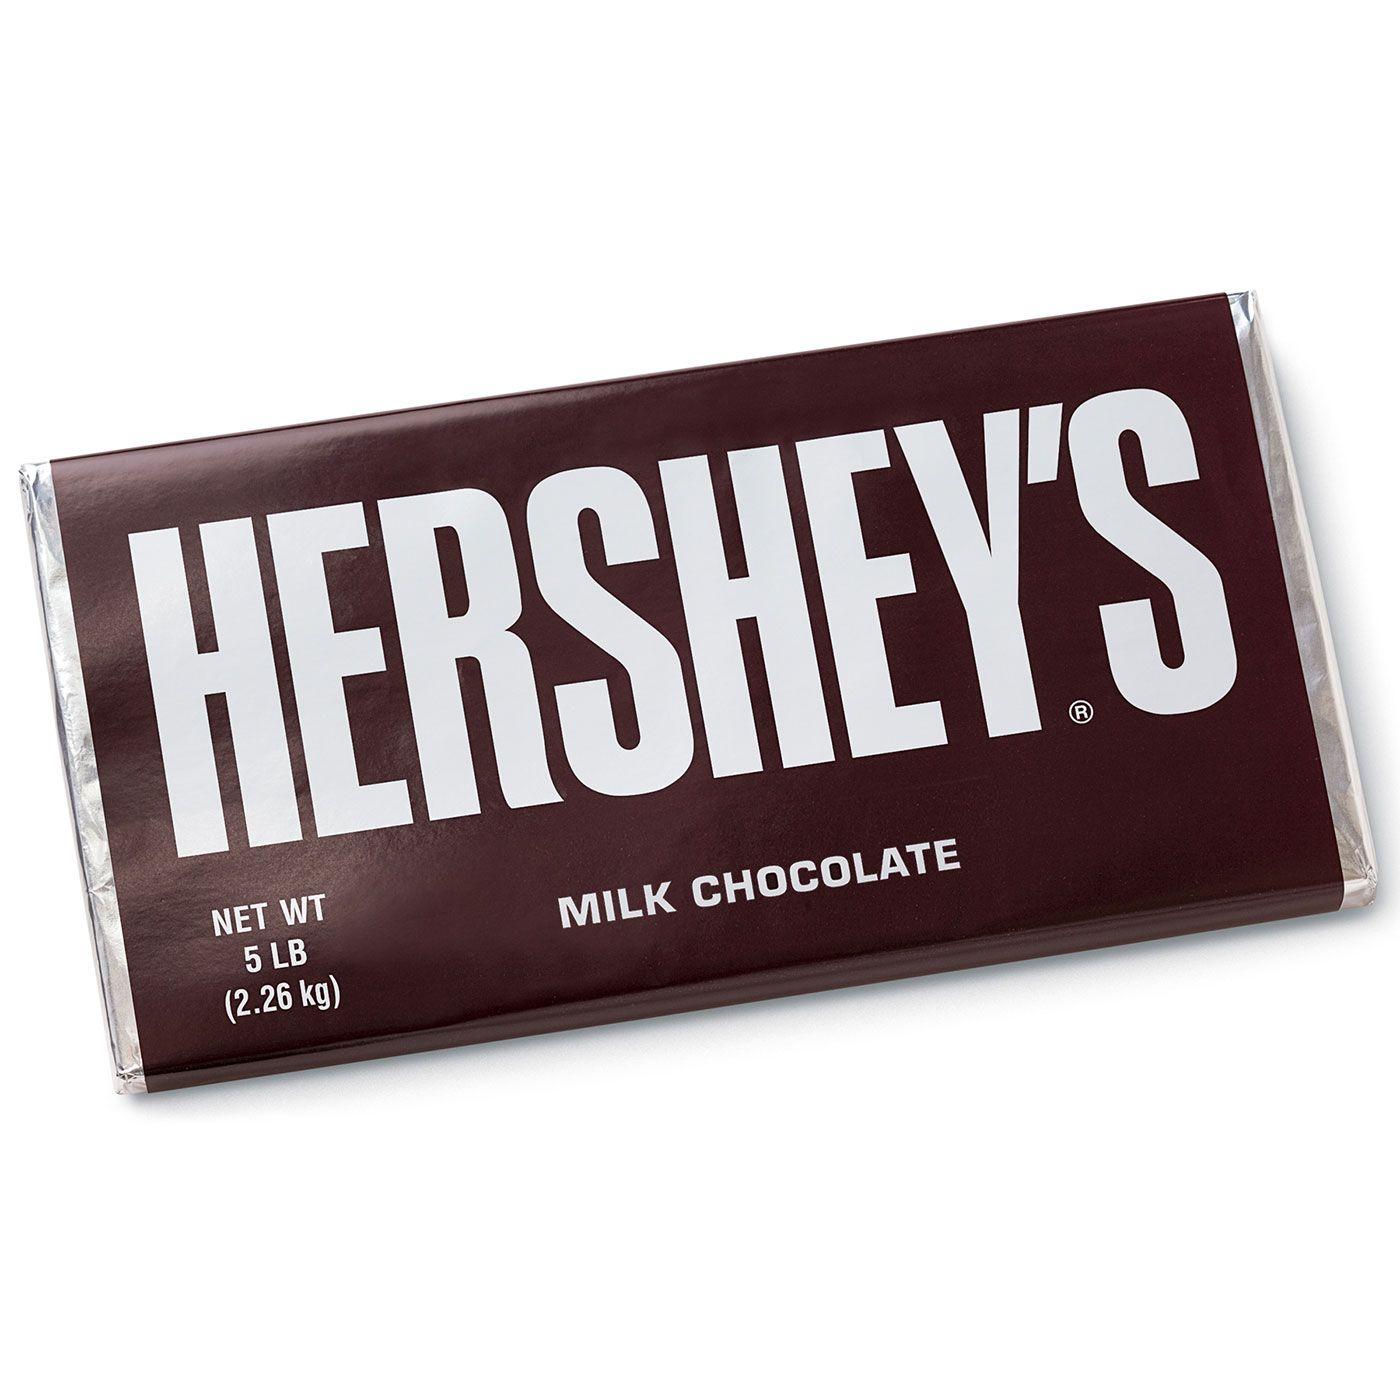 World's Largest HERSHEY'S Milk Chocolate Bar